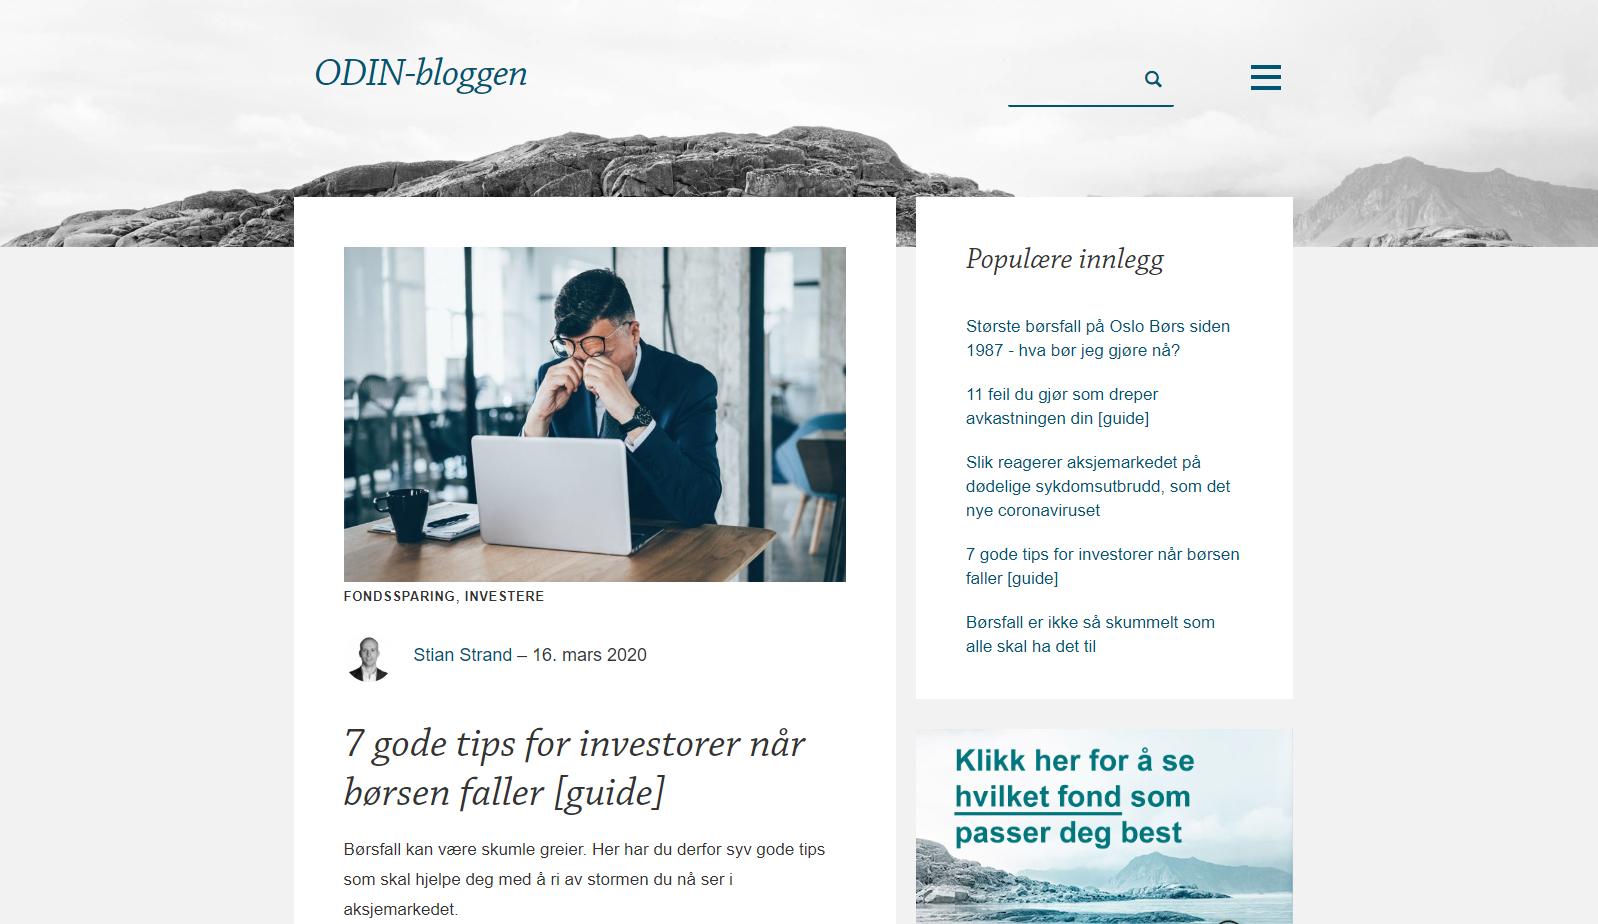 odin-bloggene